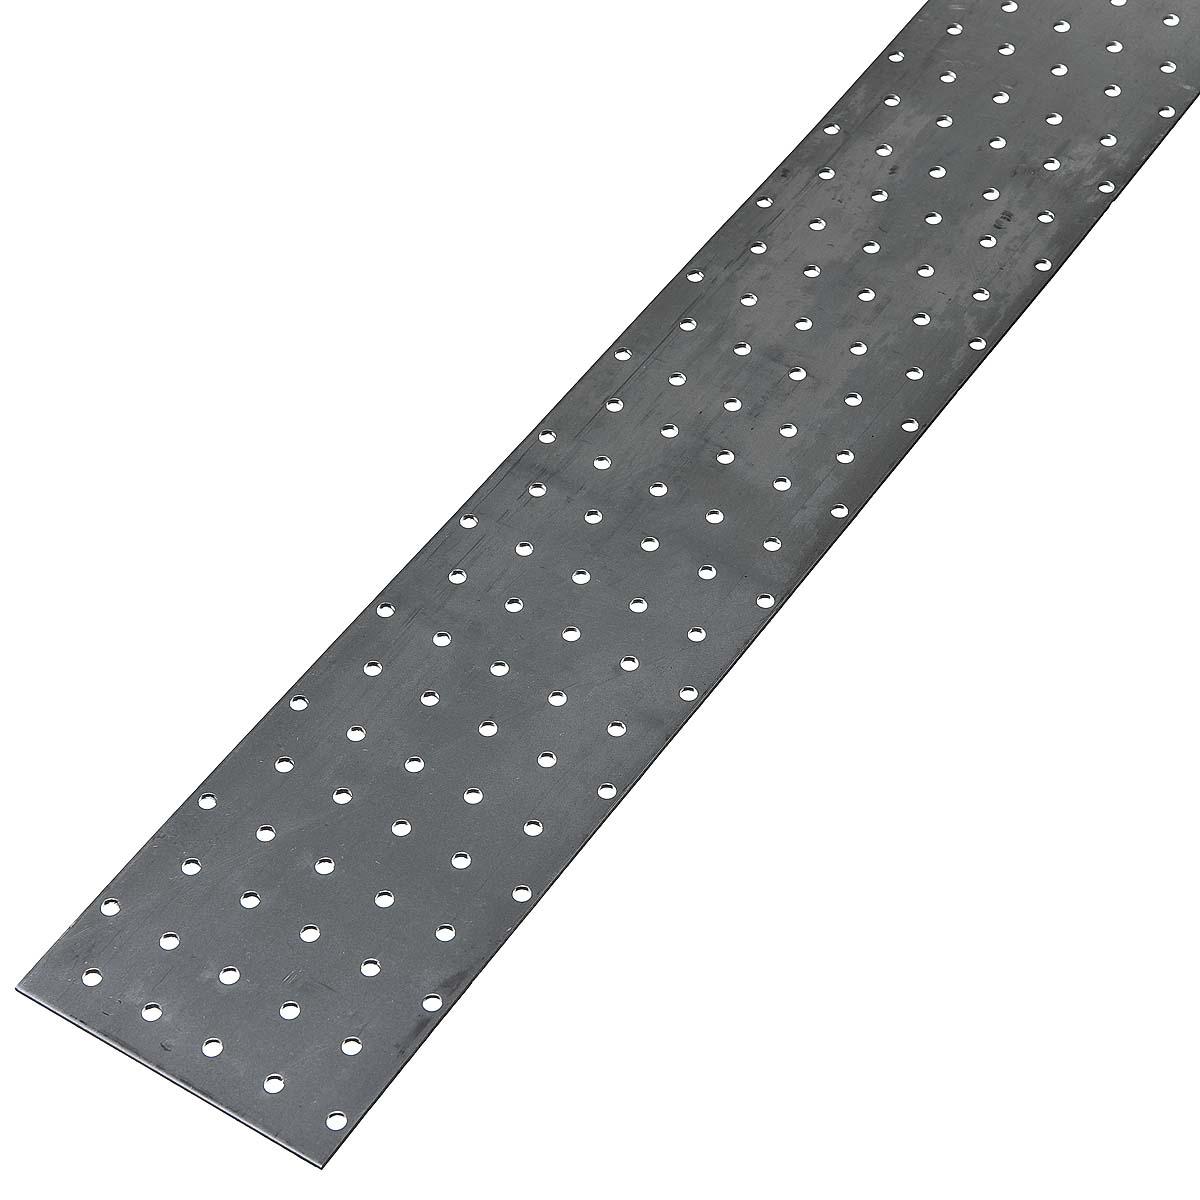 Пластина соединительная оцинкованная 1250х100х2 мм